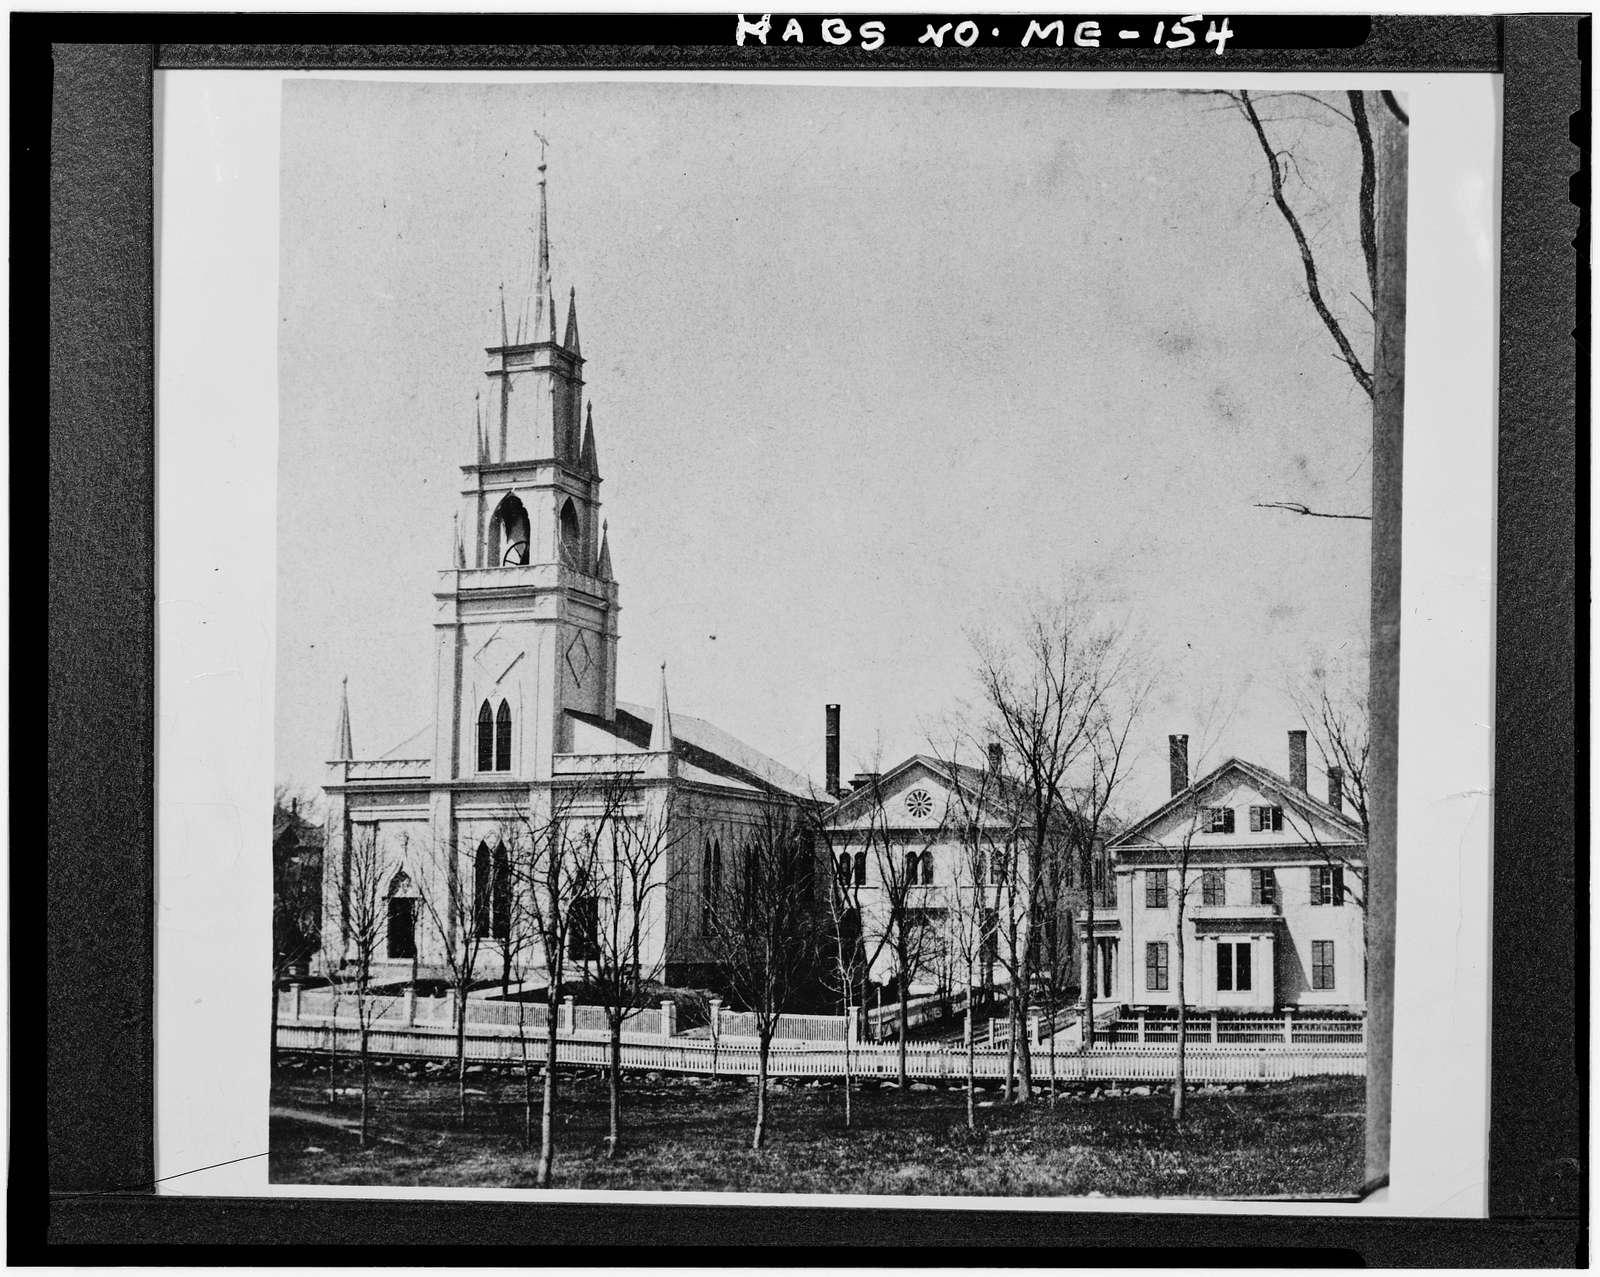 Winter Street Church, 880 Washington Street, Bath, Sagadahoc County, ME